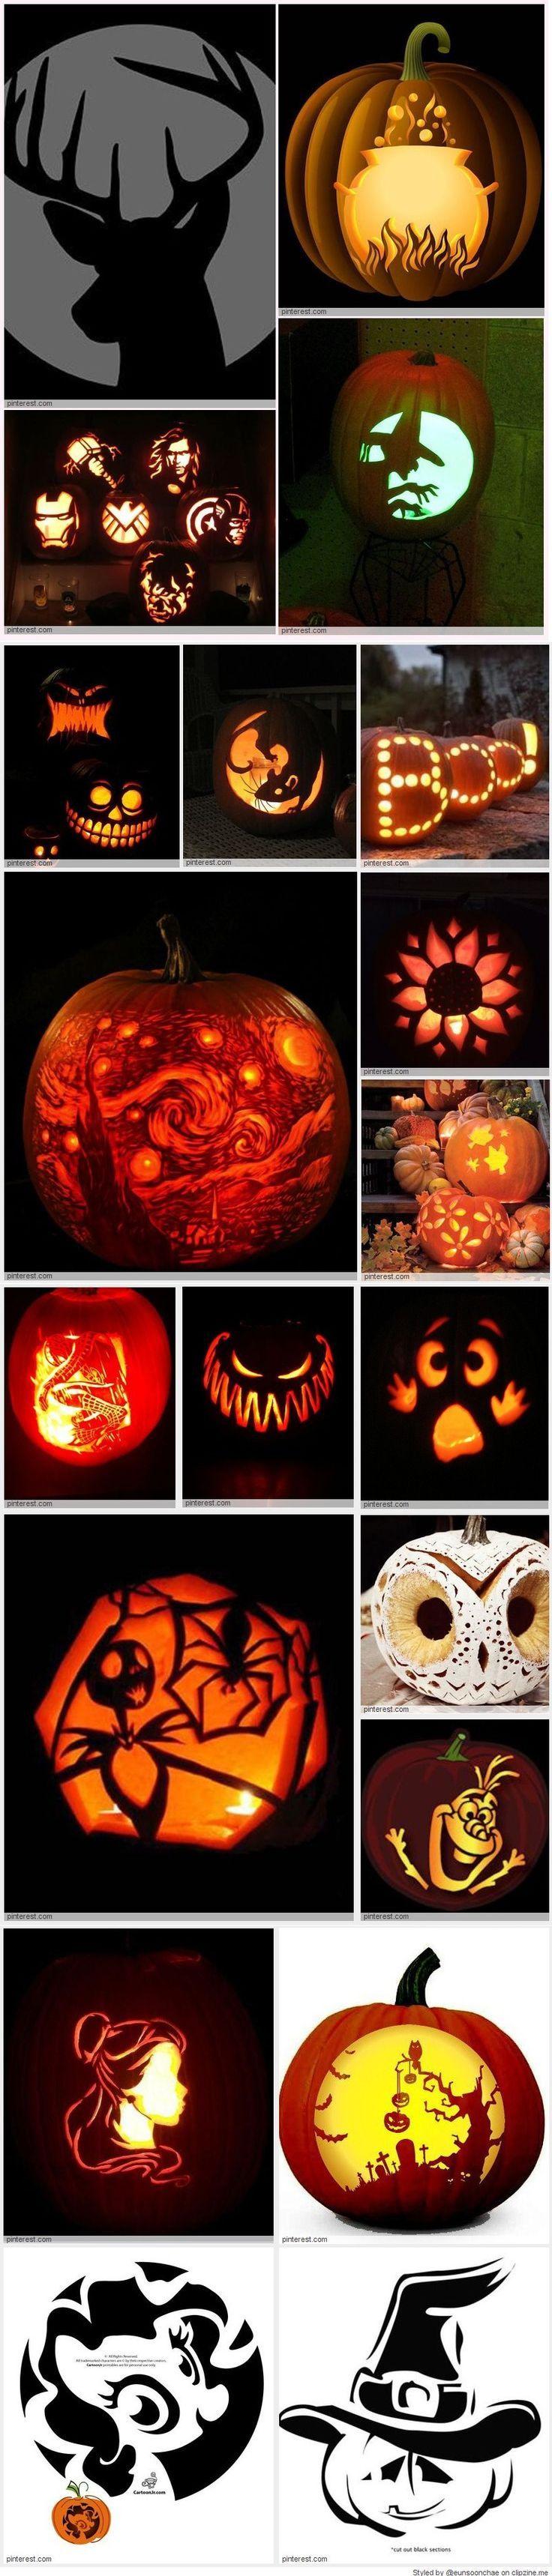 Nettes Halloween Muster Vektor Abbildung 1